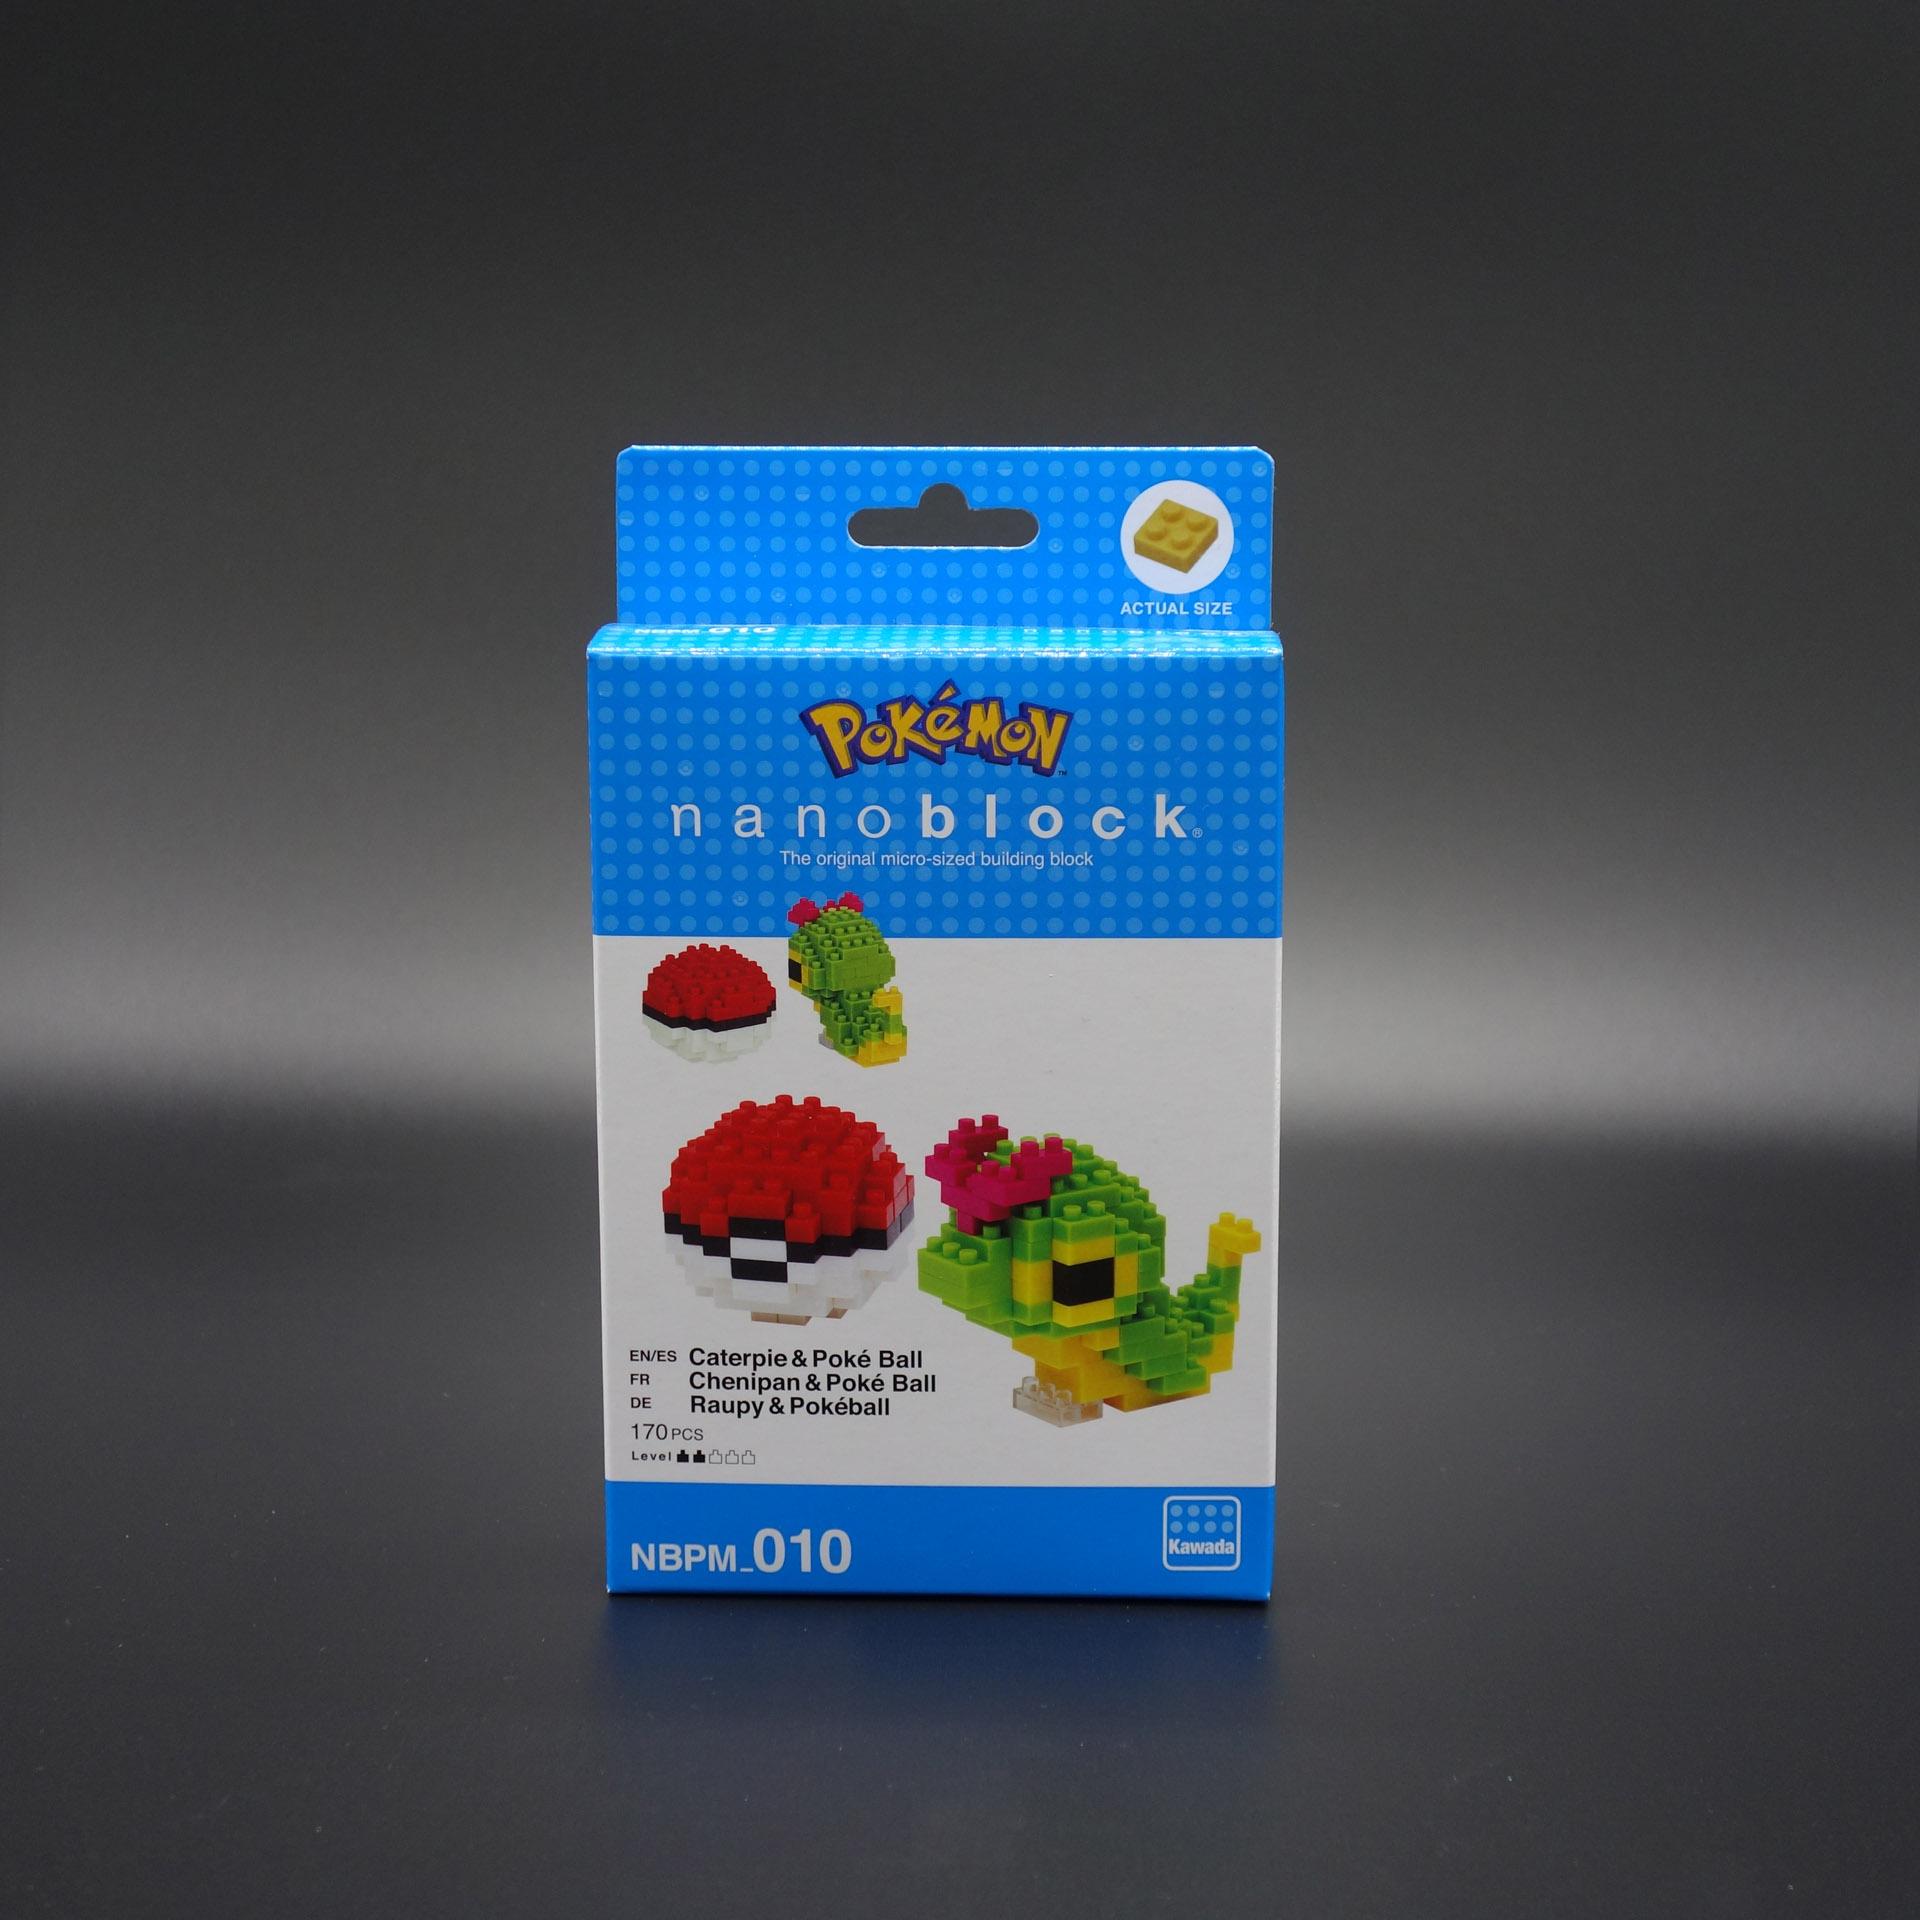 Pokemon nanoblock Raupy & Pokeball